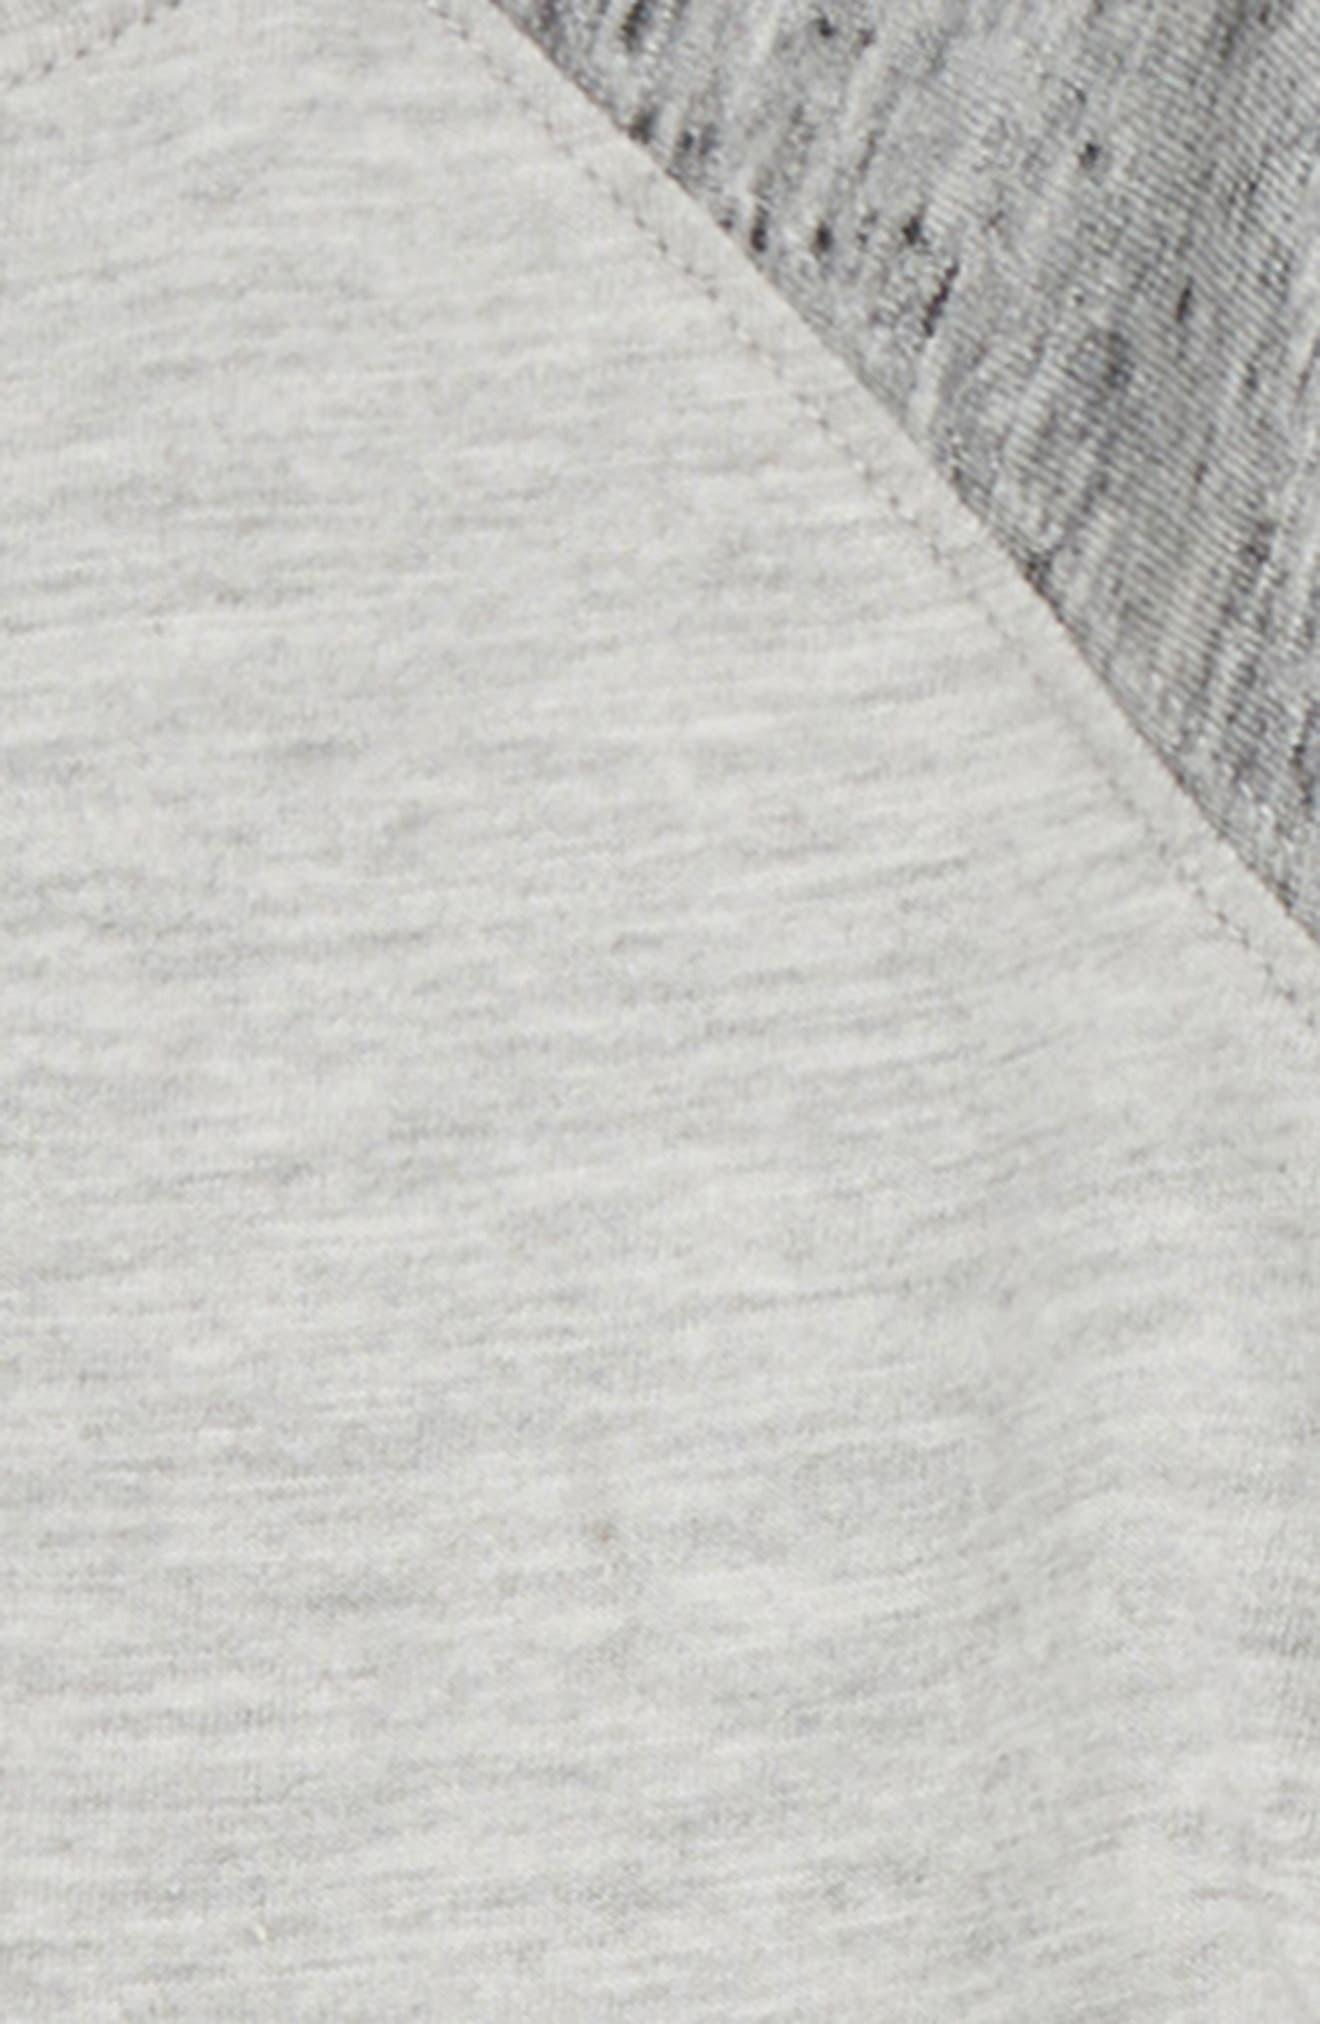 Raglan T-Shirt & Sweatpants Set,                             Alternate thumbnail 3, color,                             LIGHT GREY HEATHER 051